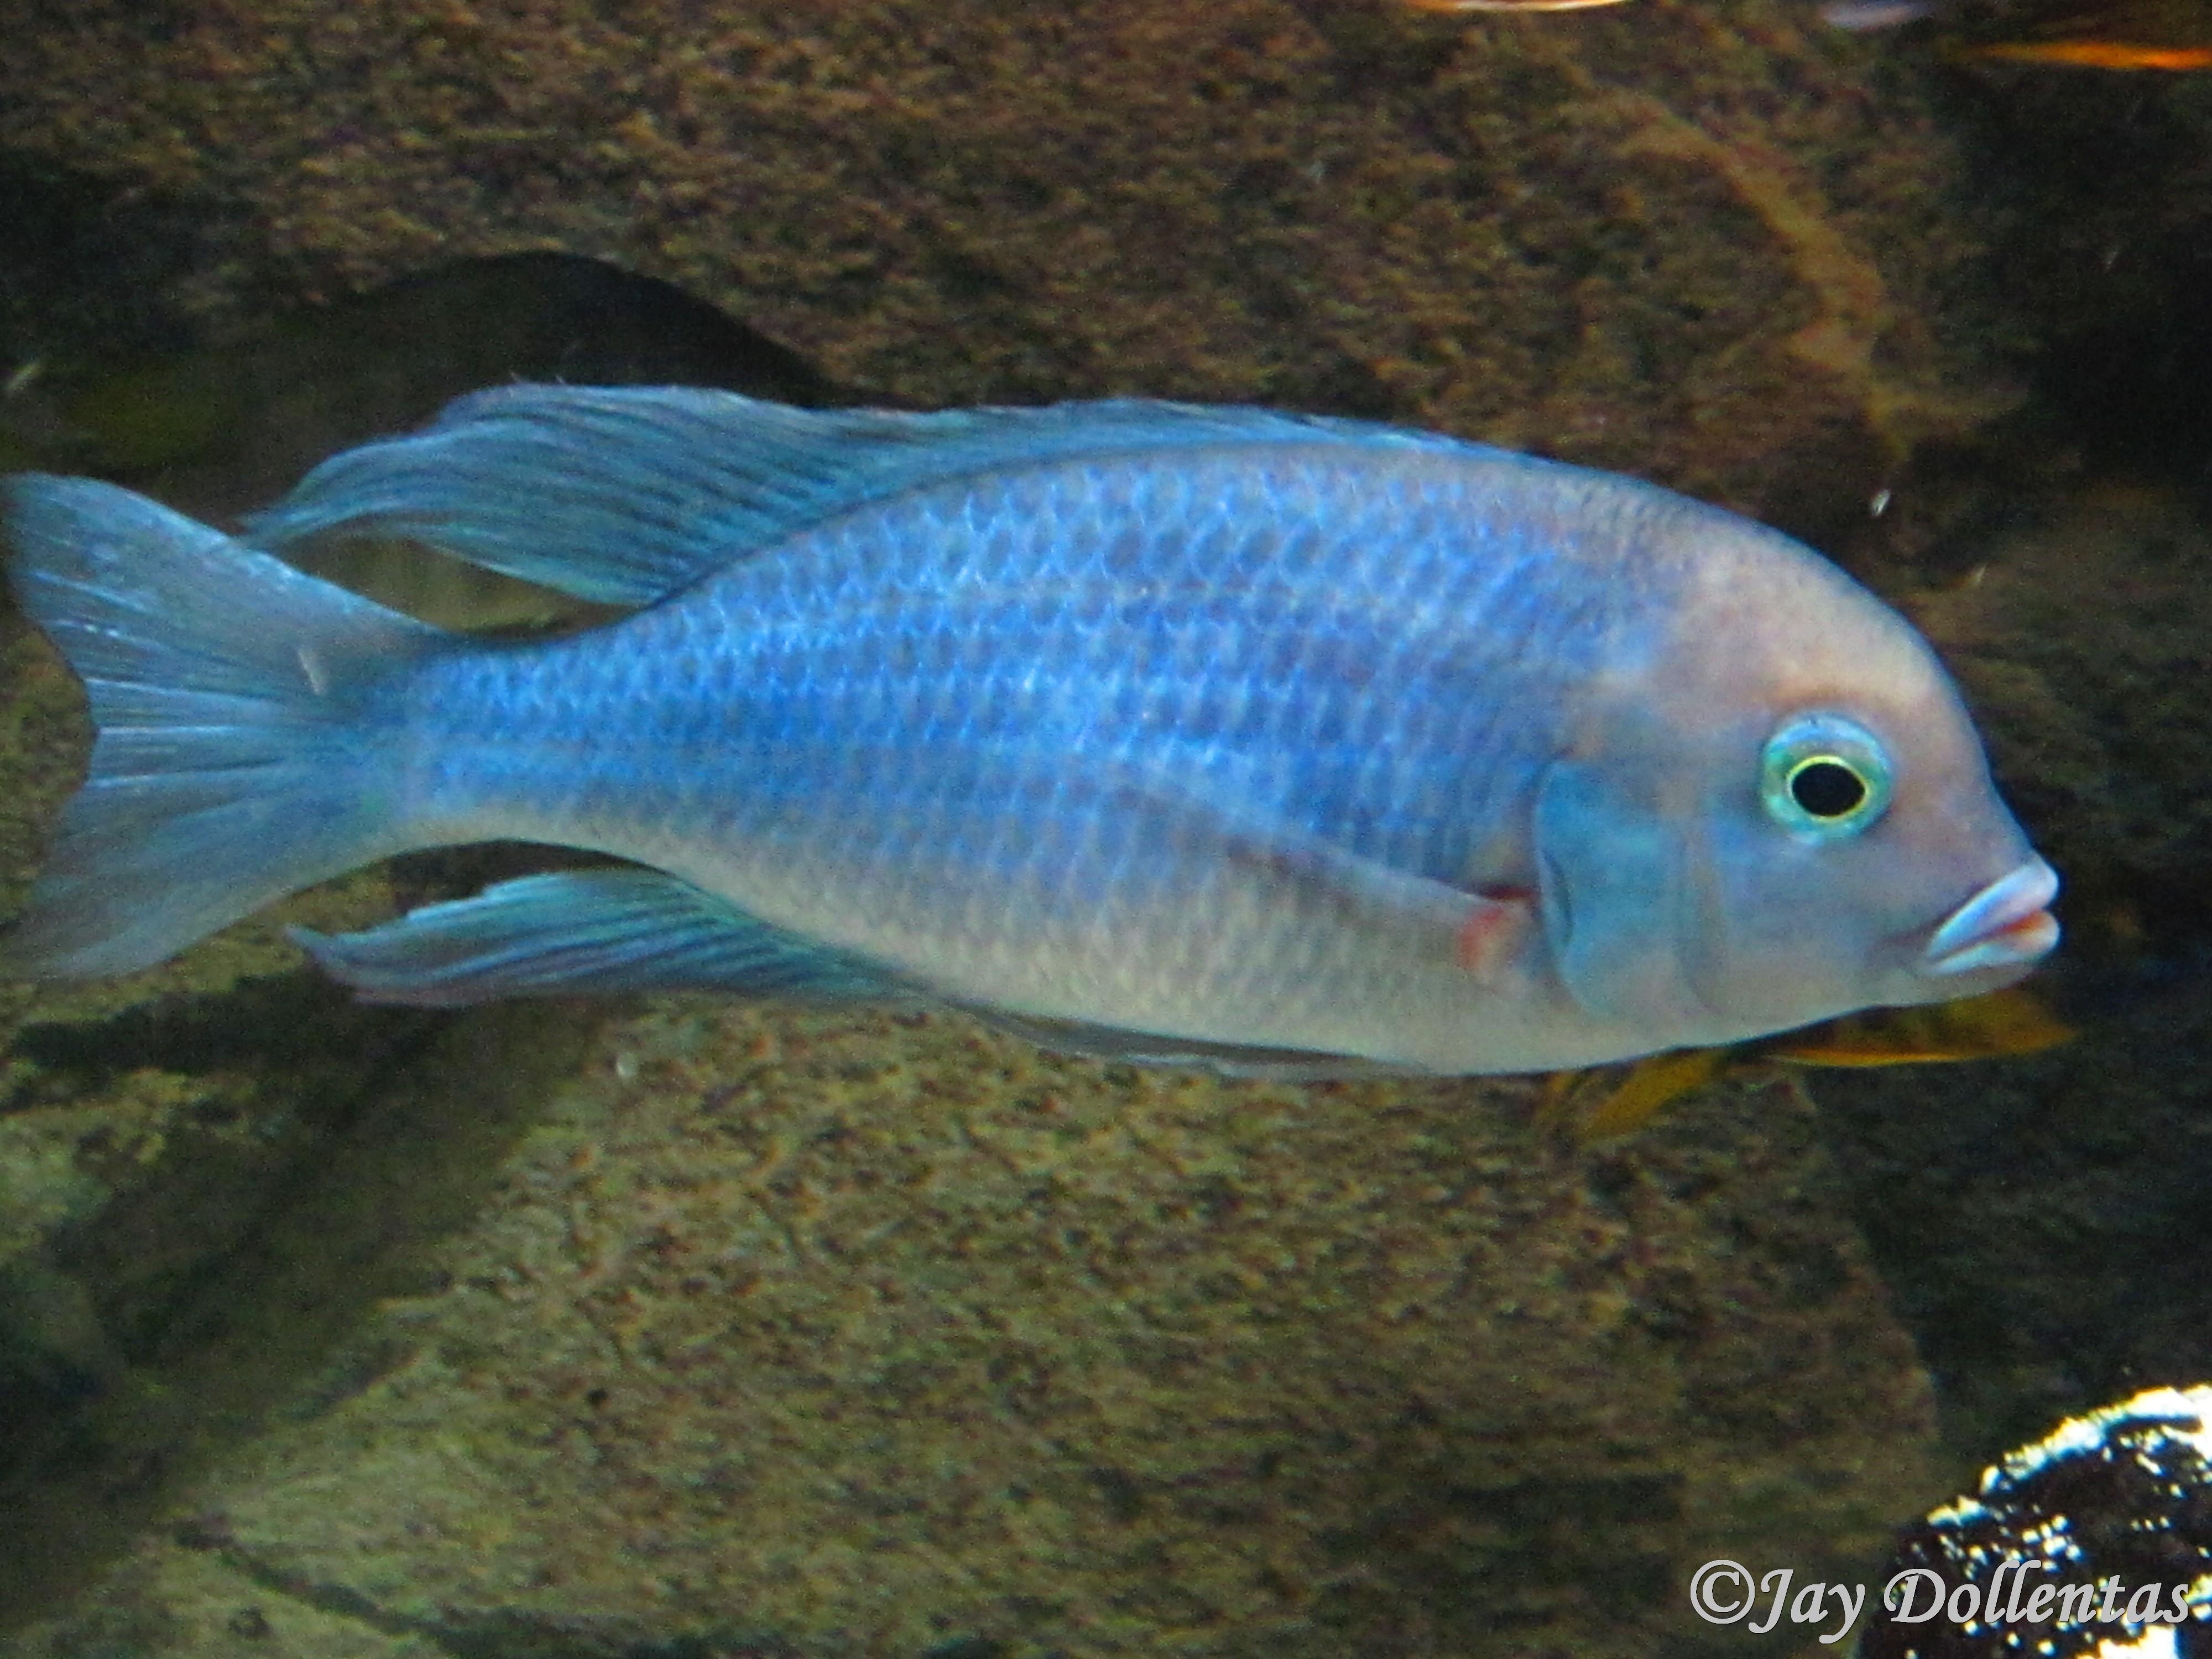 Blue Dolphin Cichlid  : Blue+Dolphin+Cichlid+For+Sale Blue Dolphin